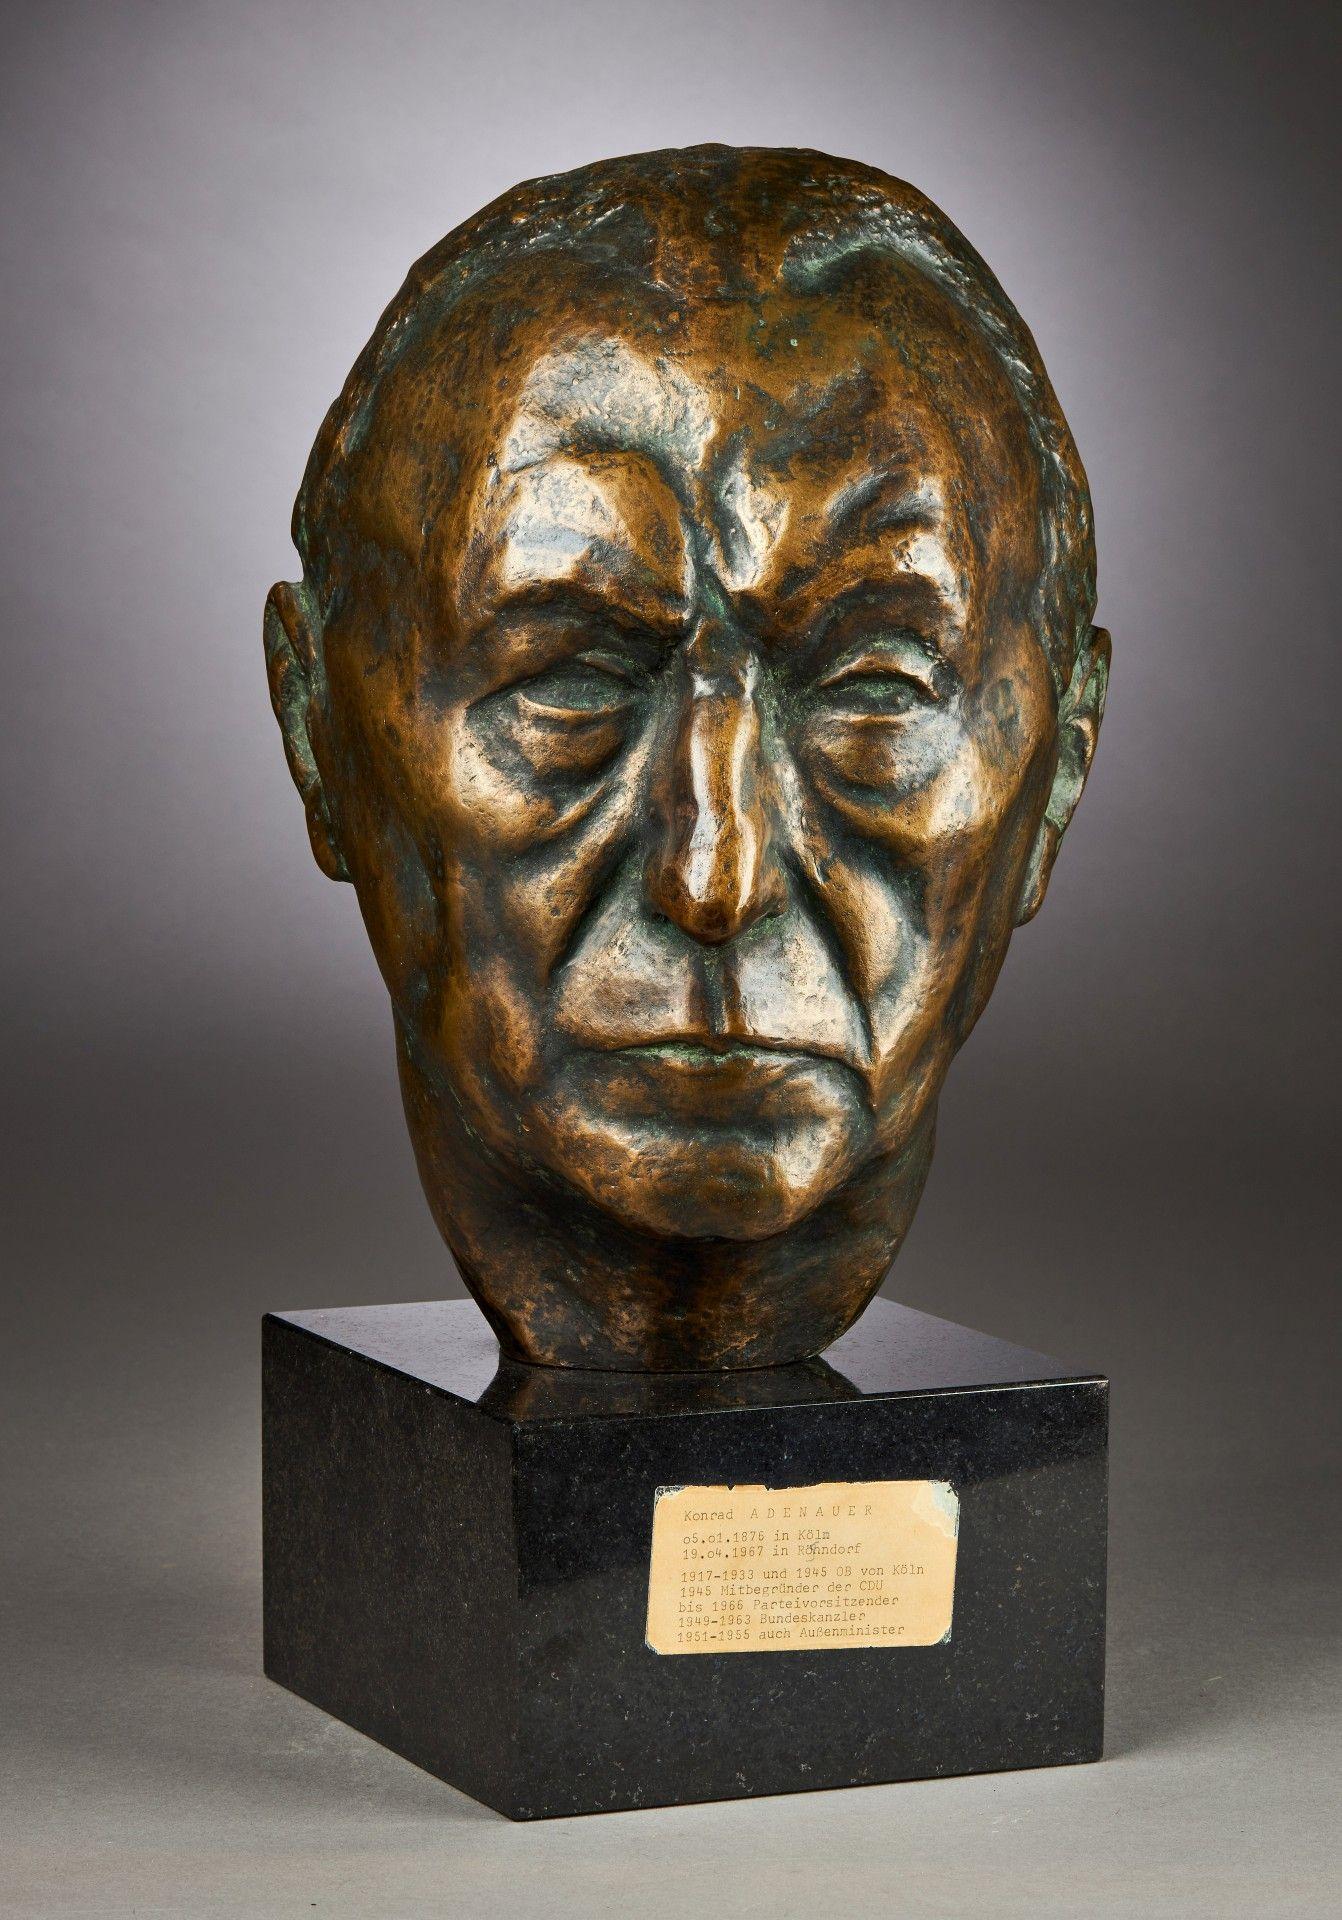 Yrsa von Leistner: Porträtbüste Konrad Adenauers.